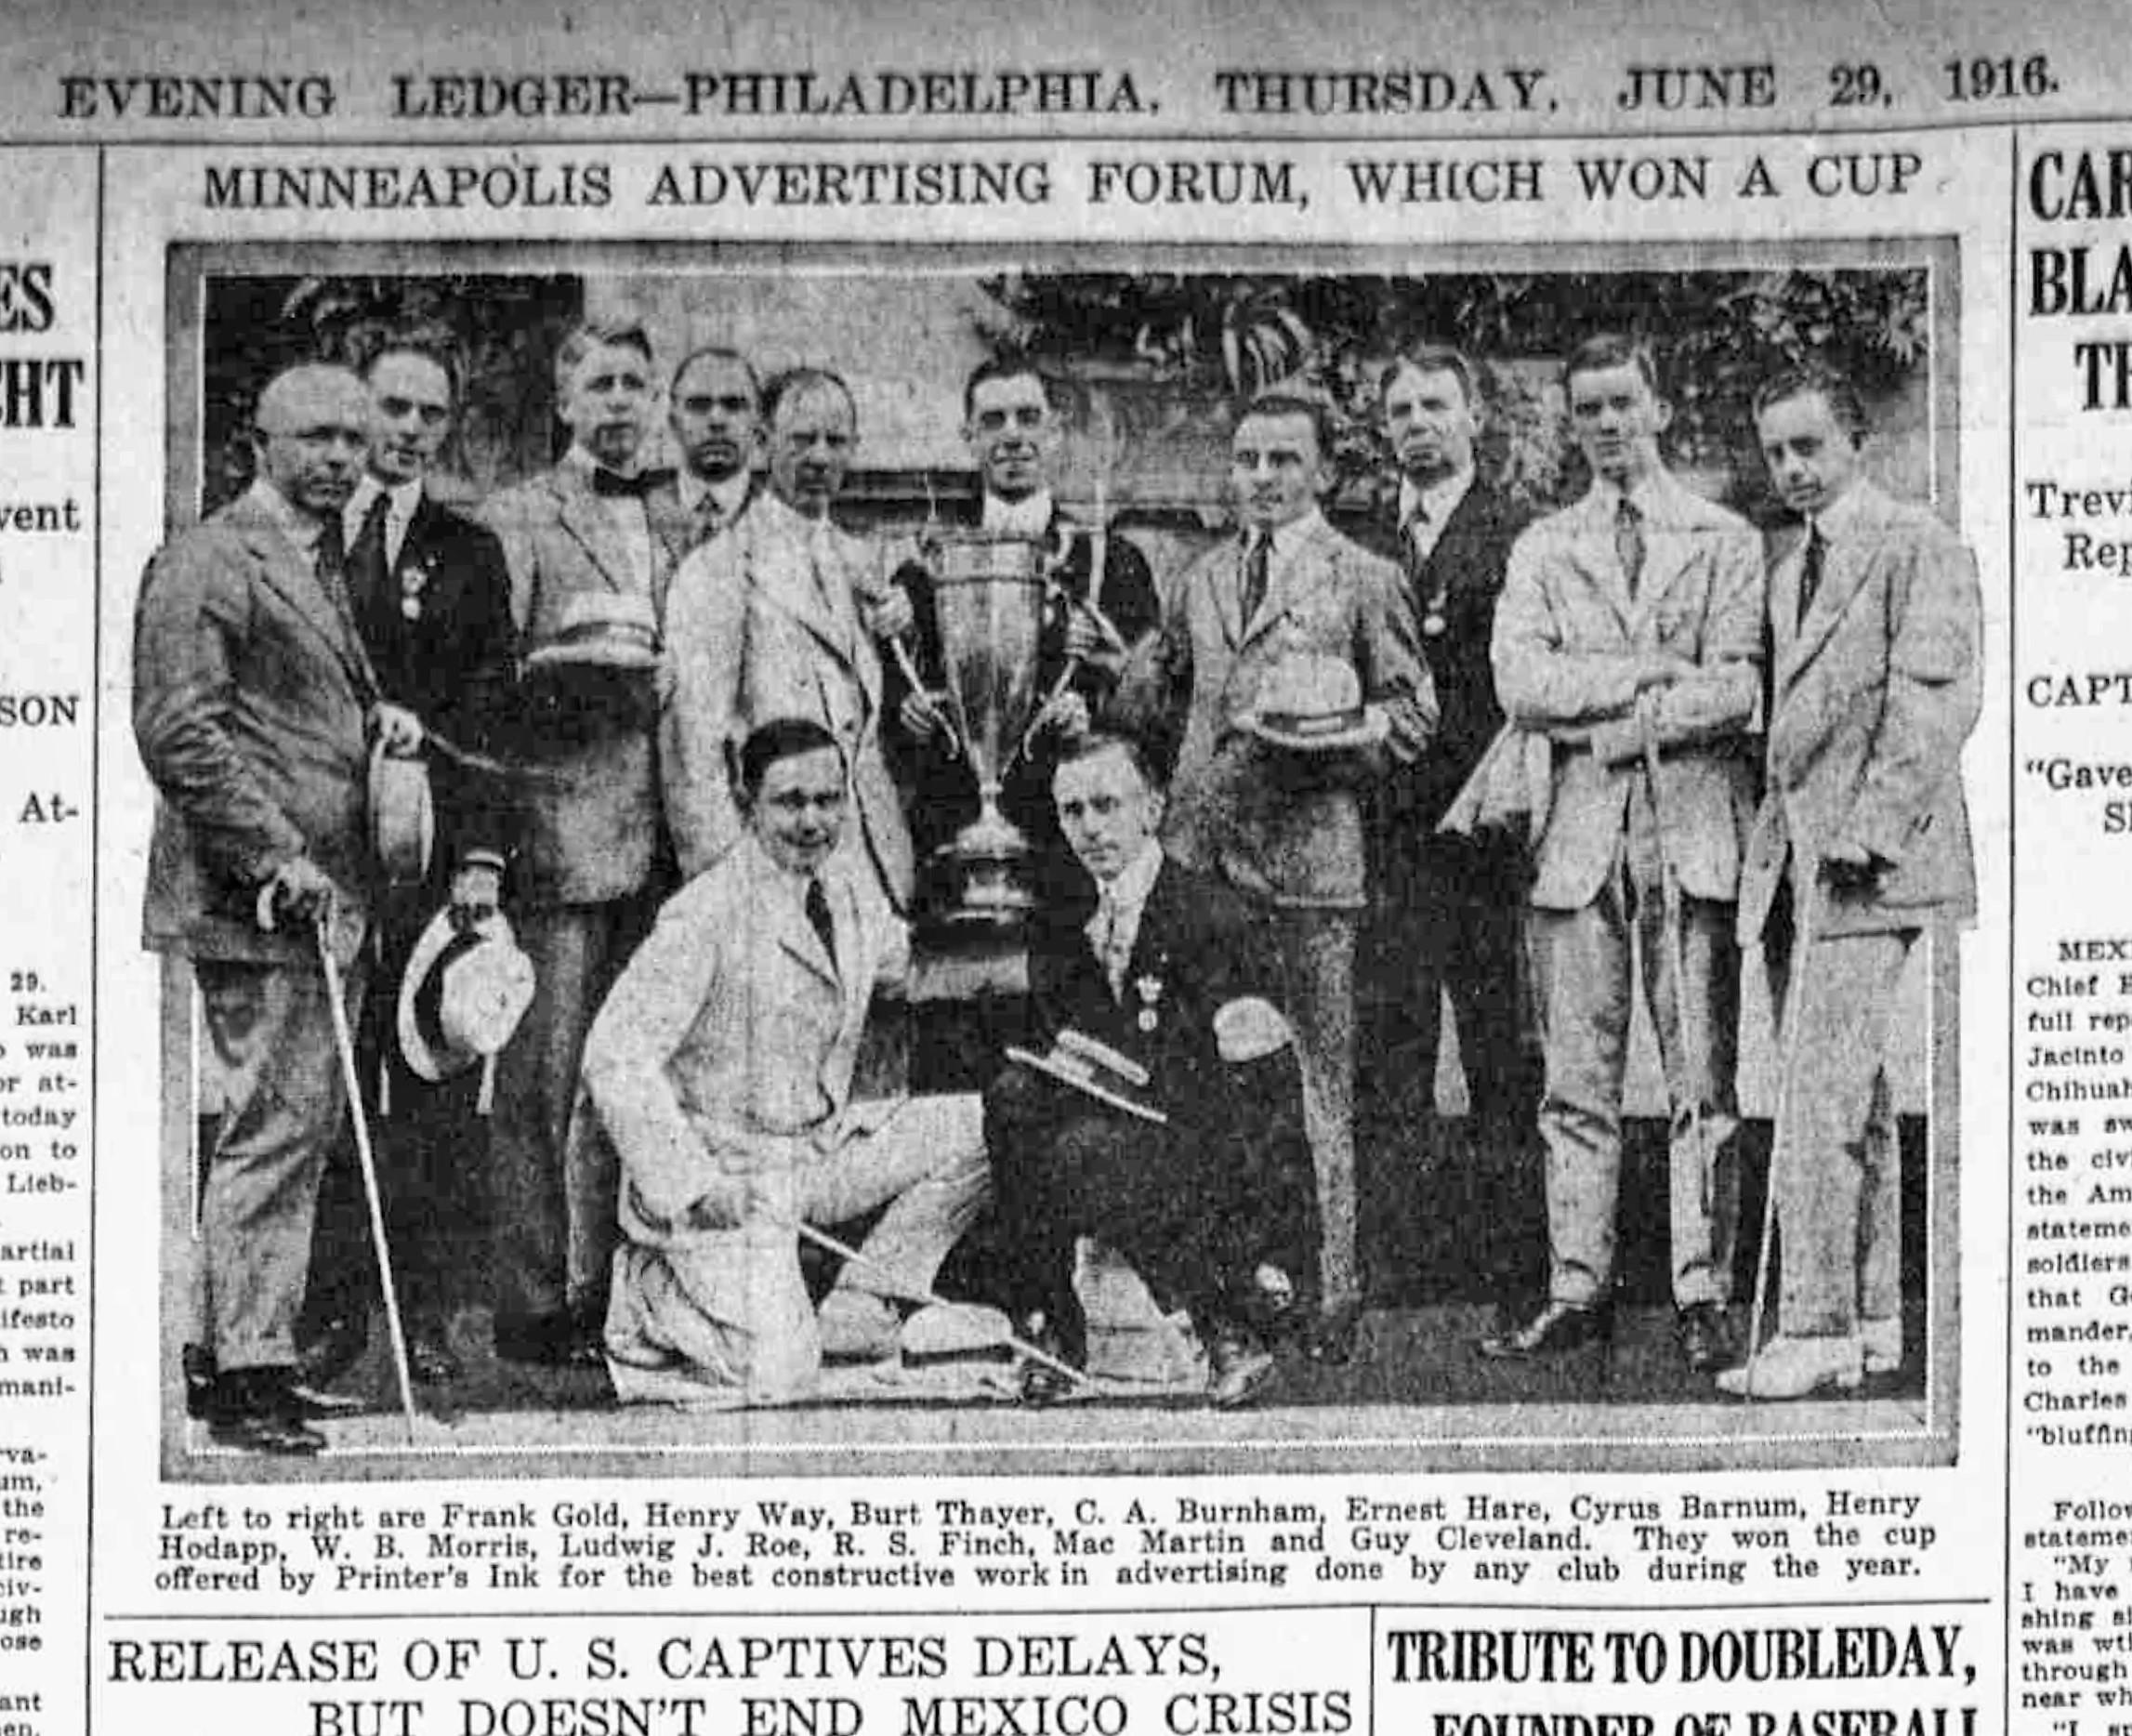 1916-PHOTO-MAF-w-PIC-6-29-1916-Phila-Evening-Ledger.jpg